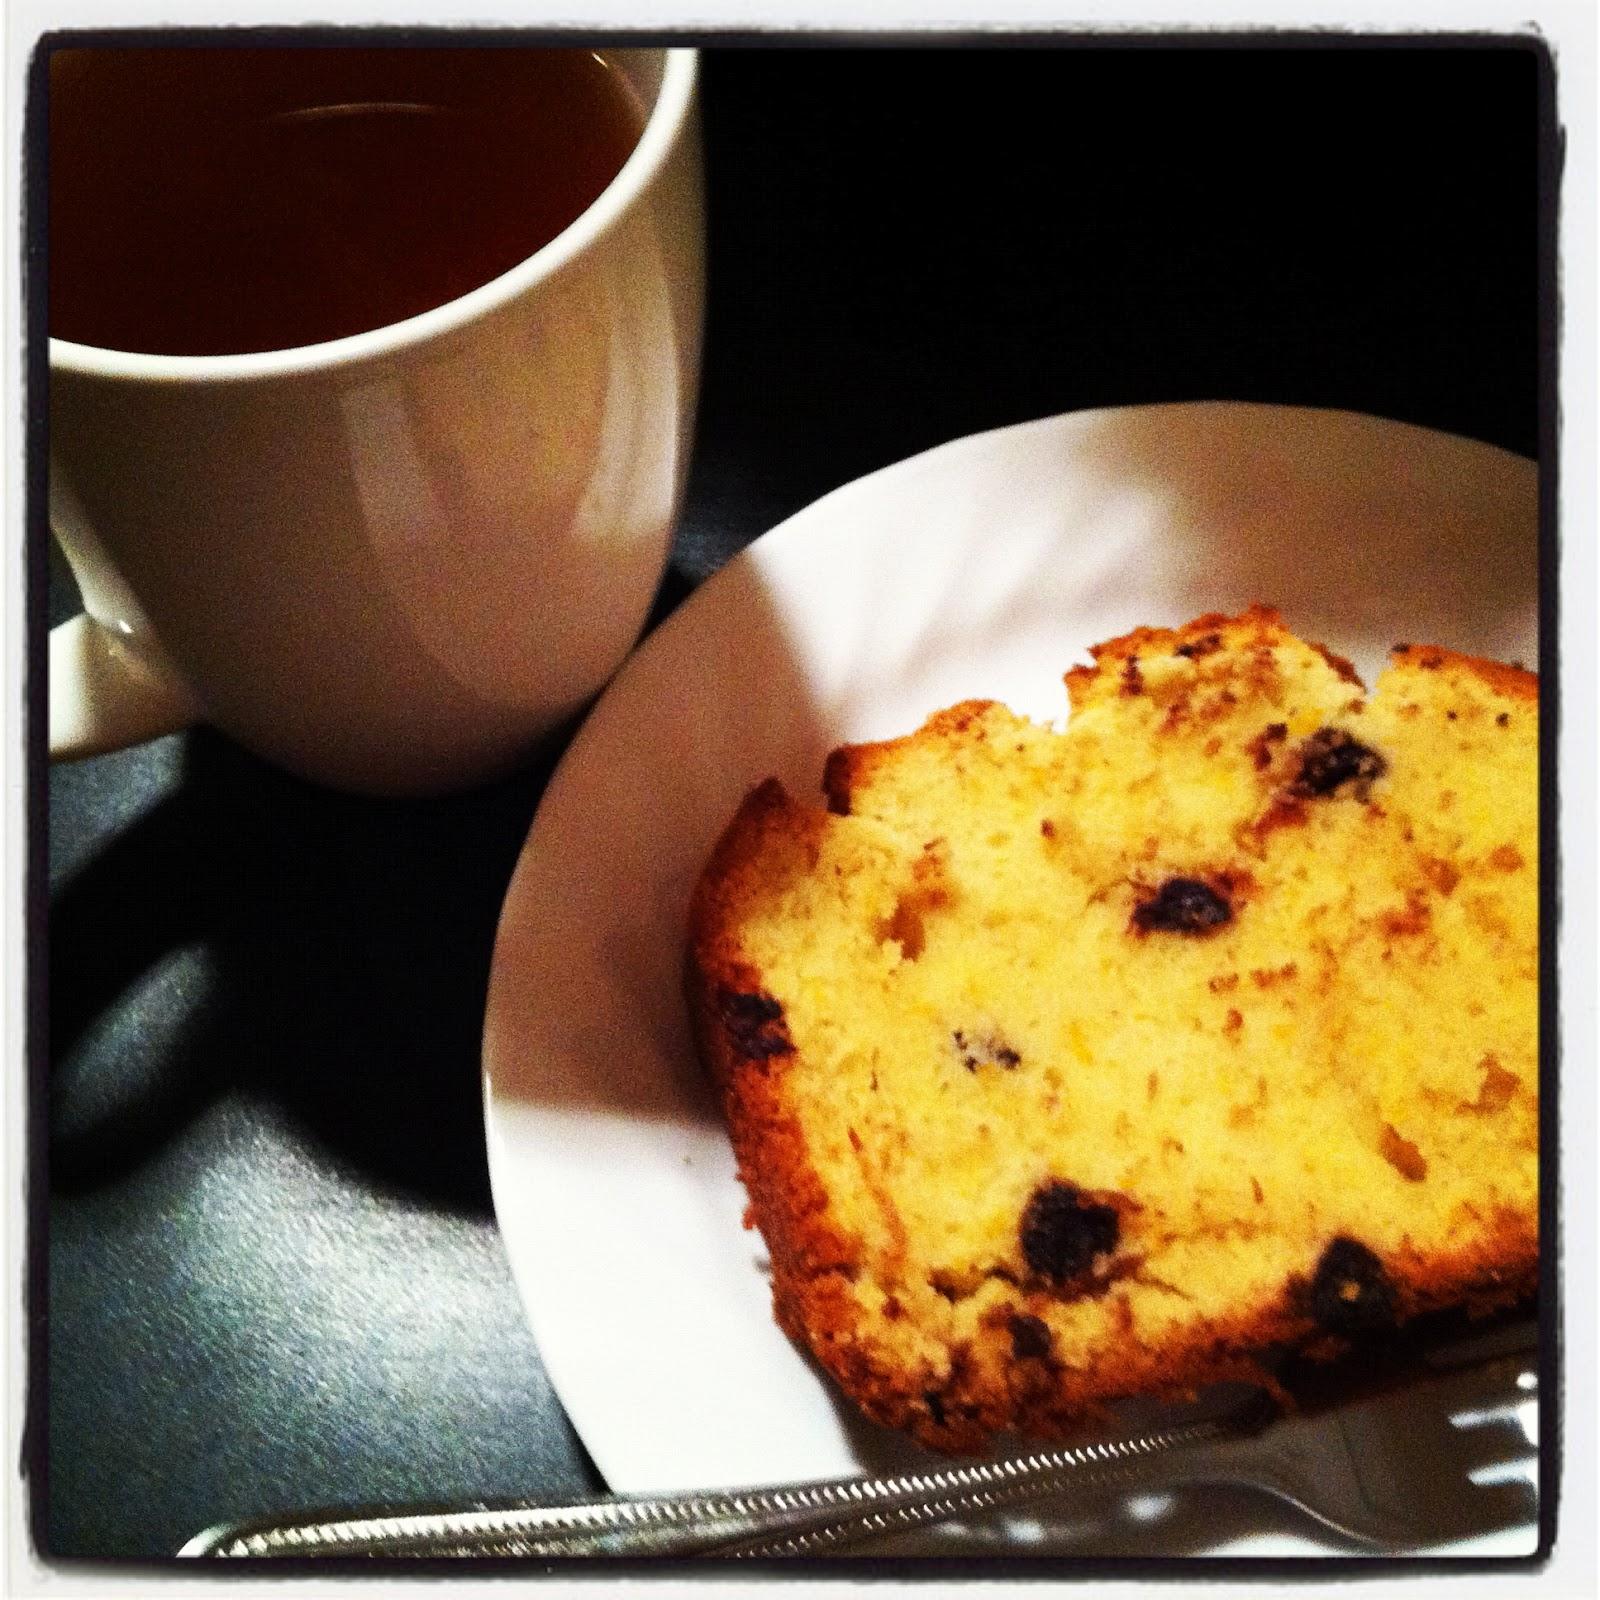 Lilac Dreams: Chocolate Orange Cream Cheese Pound Cake